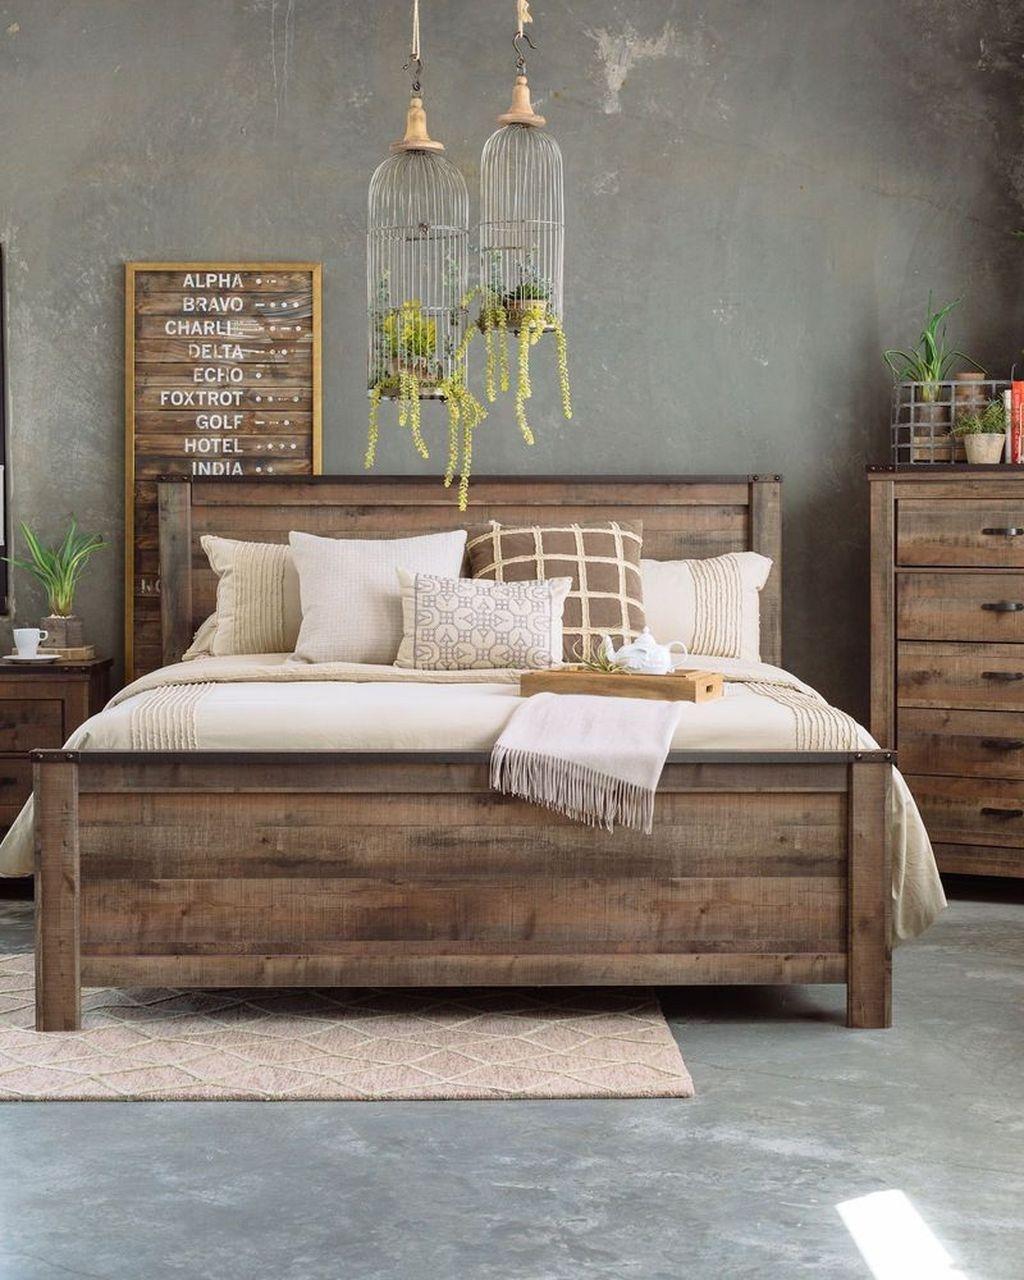 46 Cozy Bedroom Furniture Design Ideas For Farmhouse Style